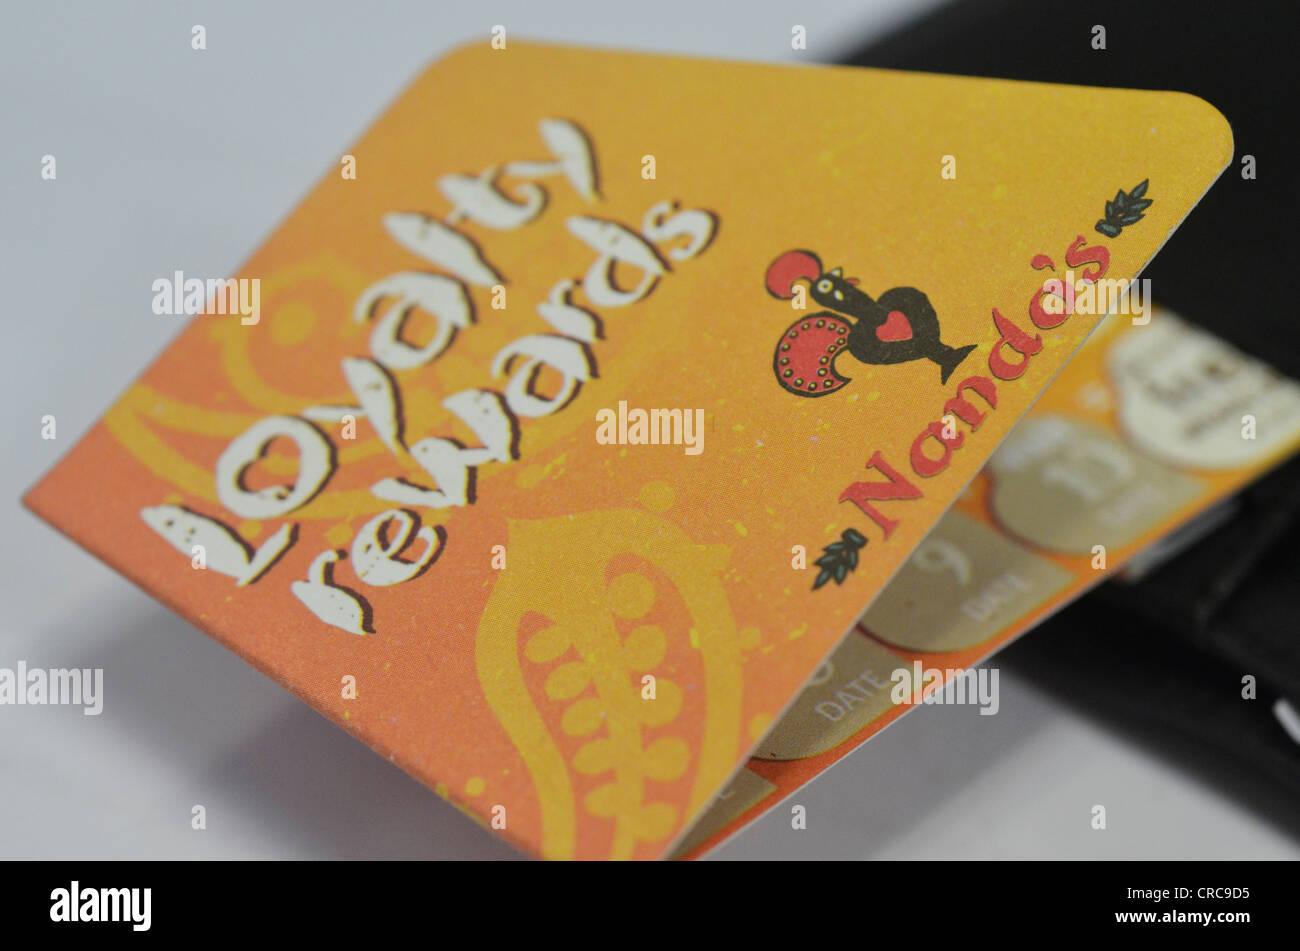 Nando's loyalty reward card from wallet - Stock Image